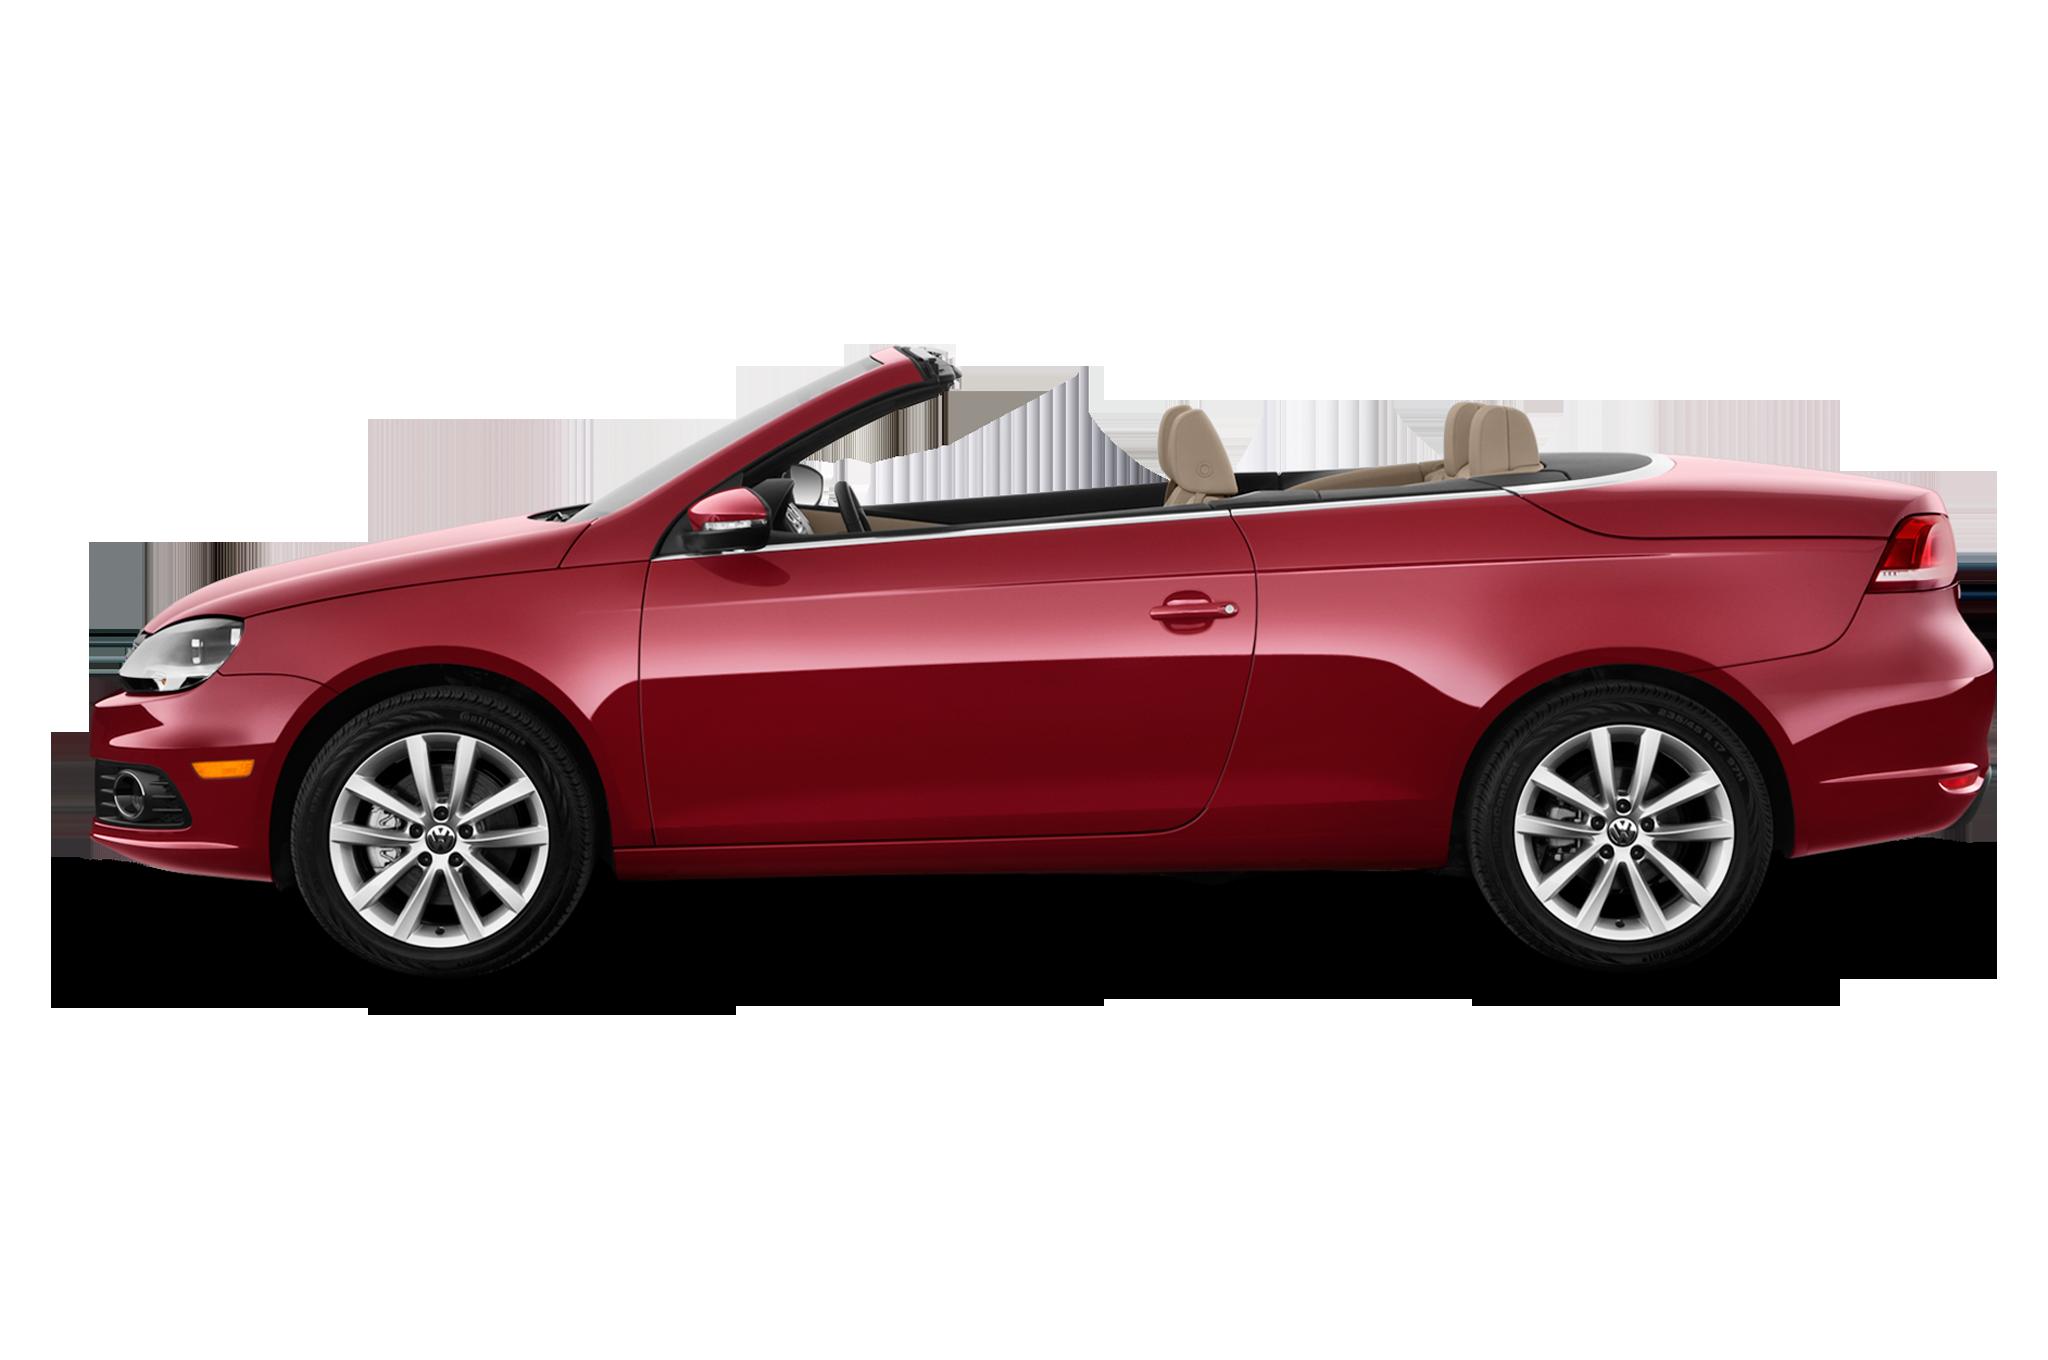 Volkswagen Eos I Restyling 2010 - 2015 Cabriolet #7